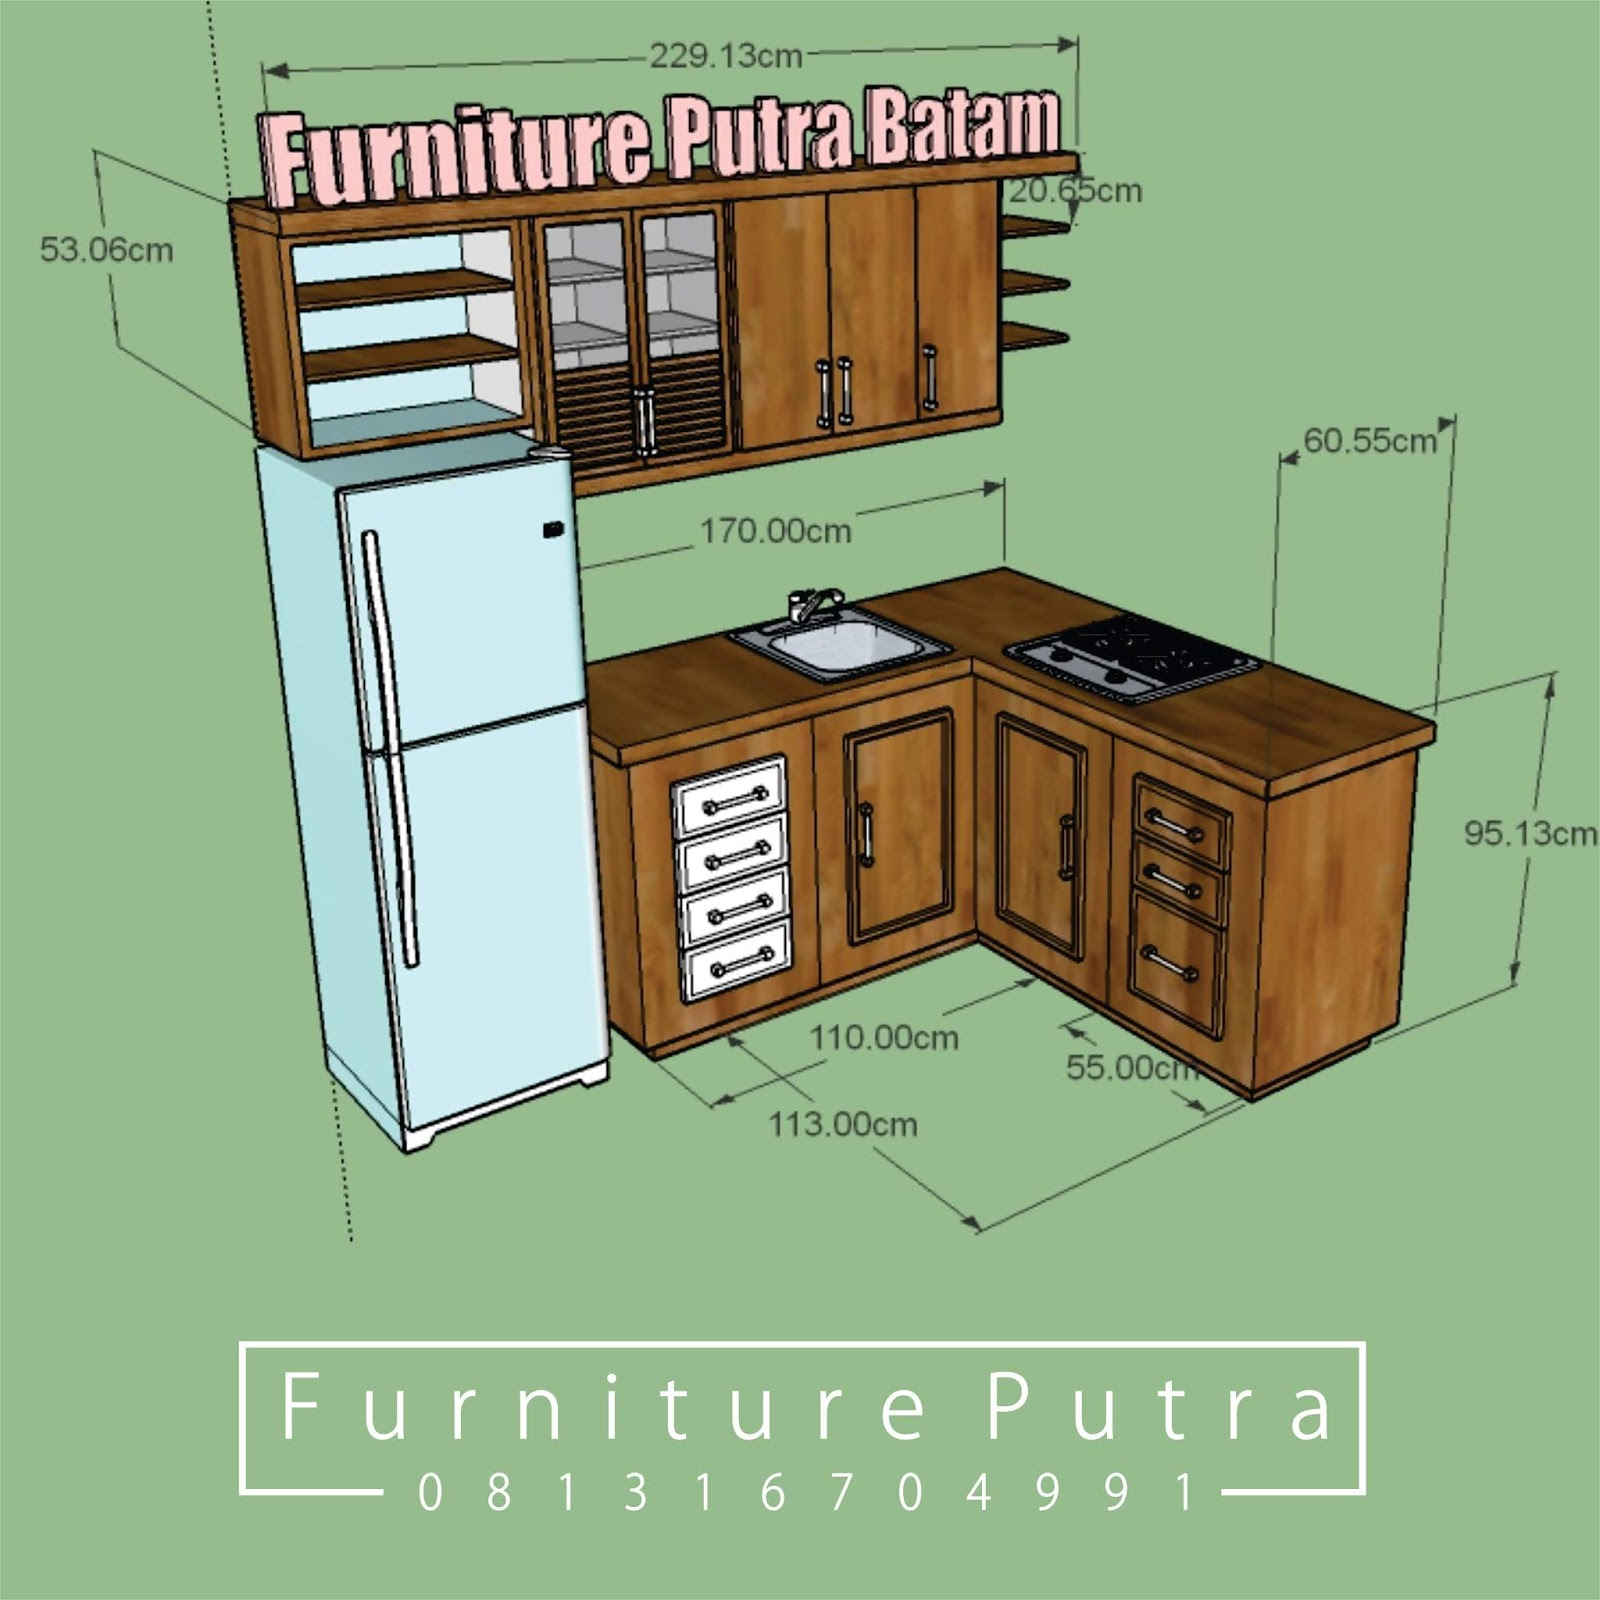 Kitchen Set di Batam   Furniture Putra Batam 9